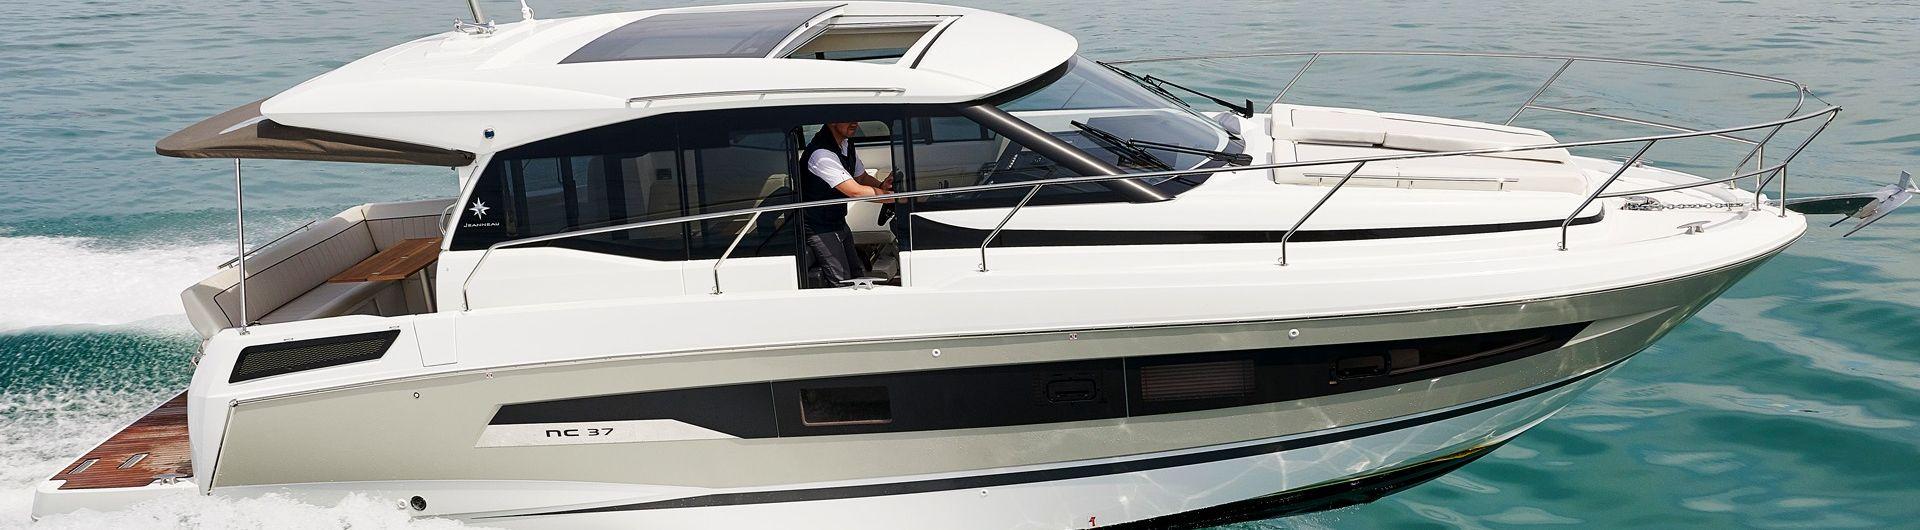 Sportboot Jeanneau NC 37 header